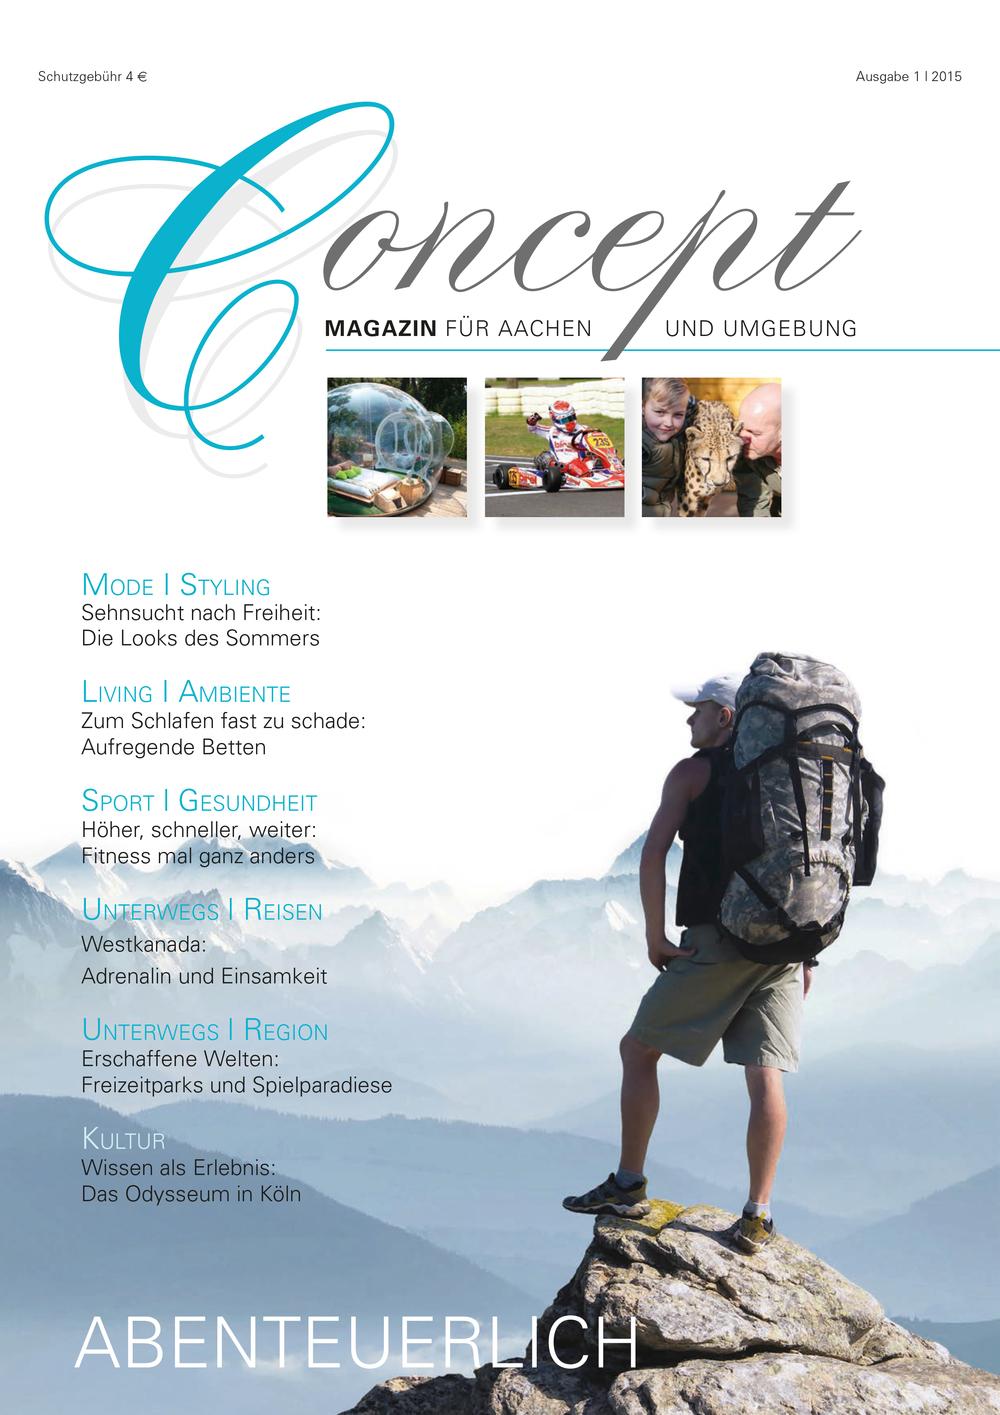 May 2015 4 Concept Magazine